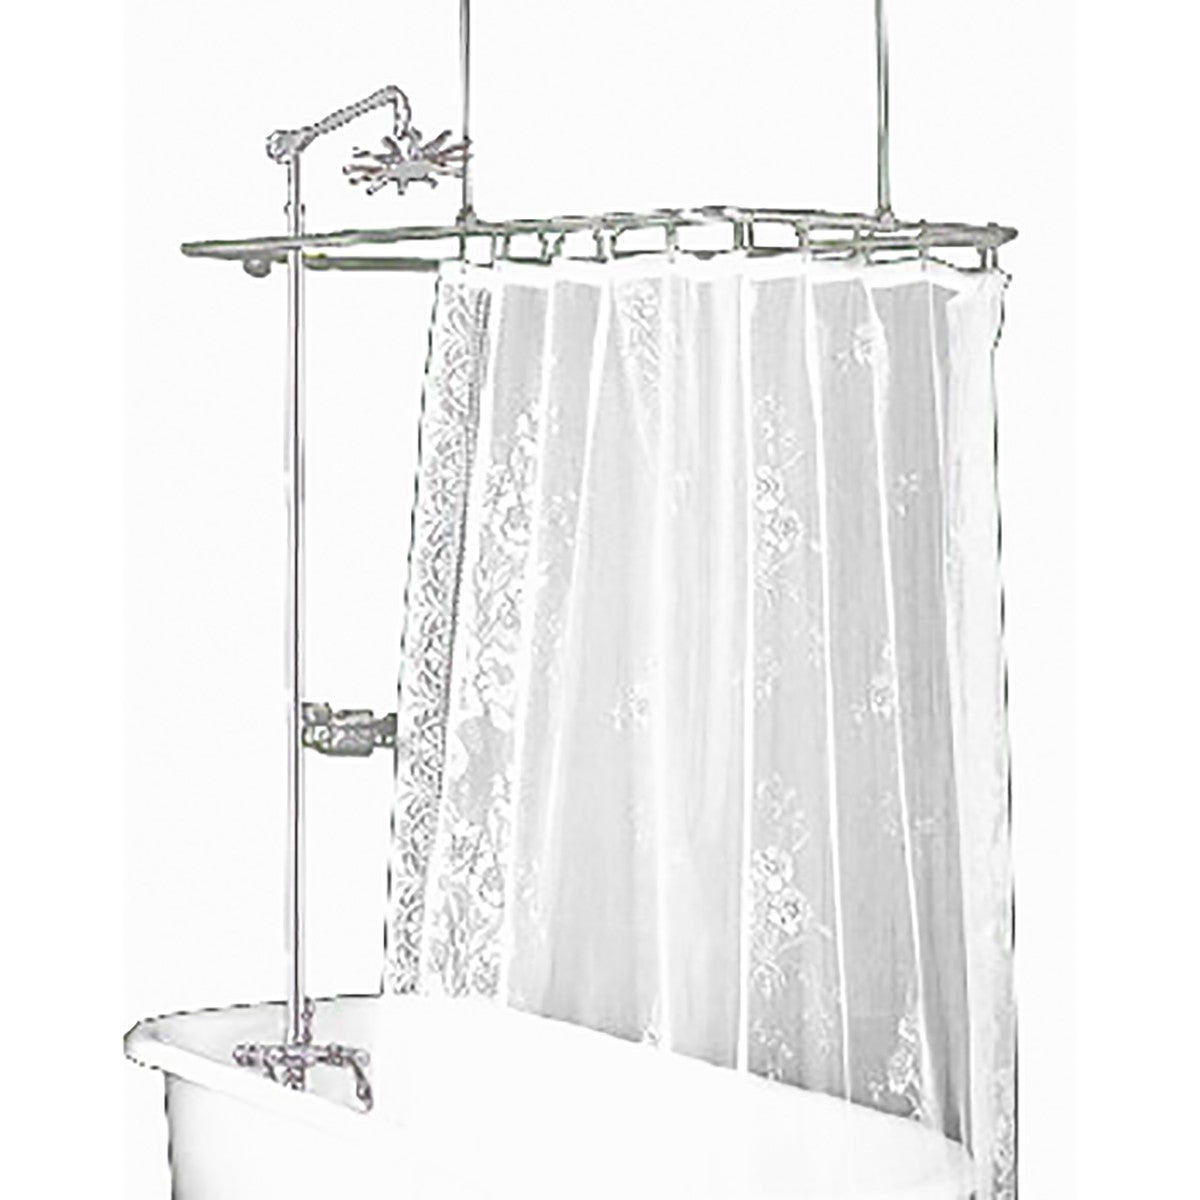 Clawfoot Tub Shower Surround Brass Rectangula Renovator S Supply